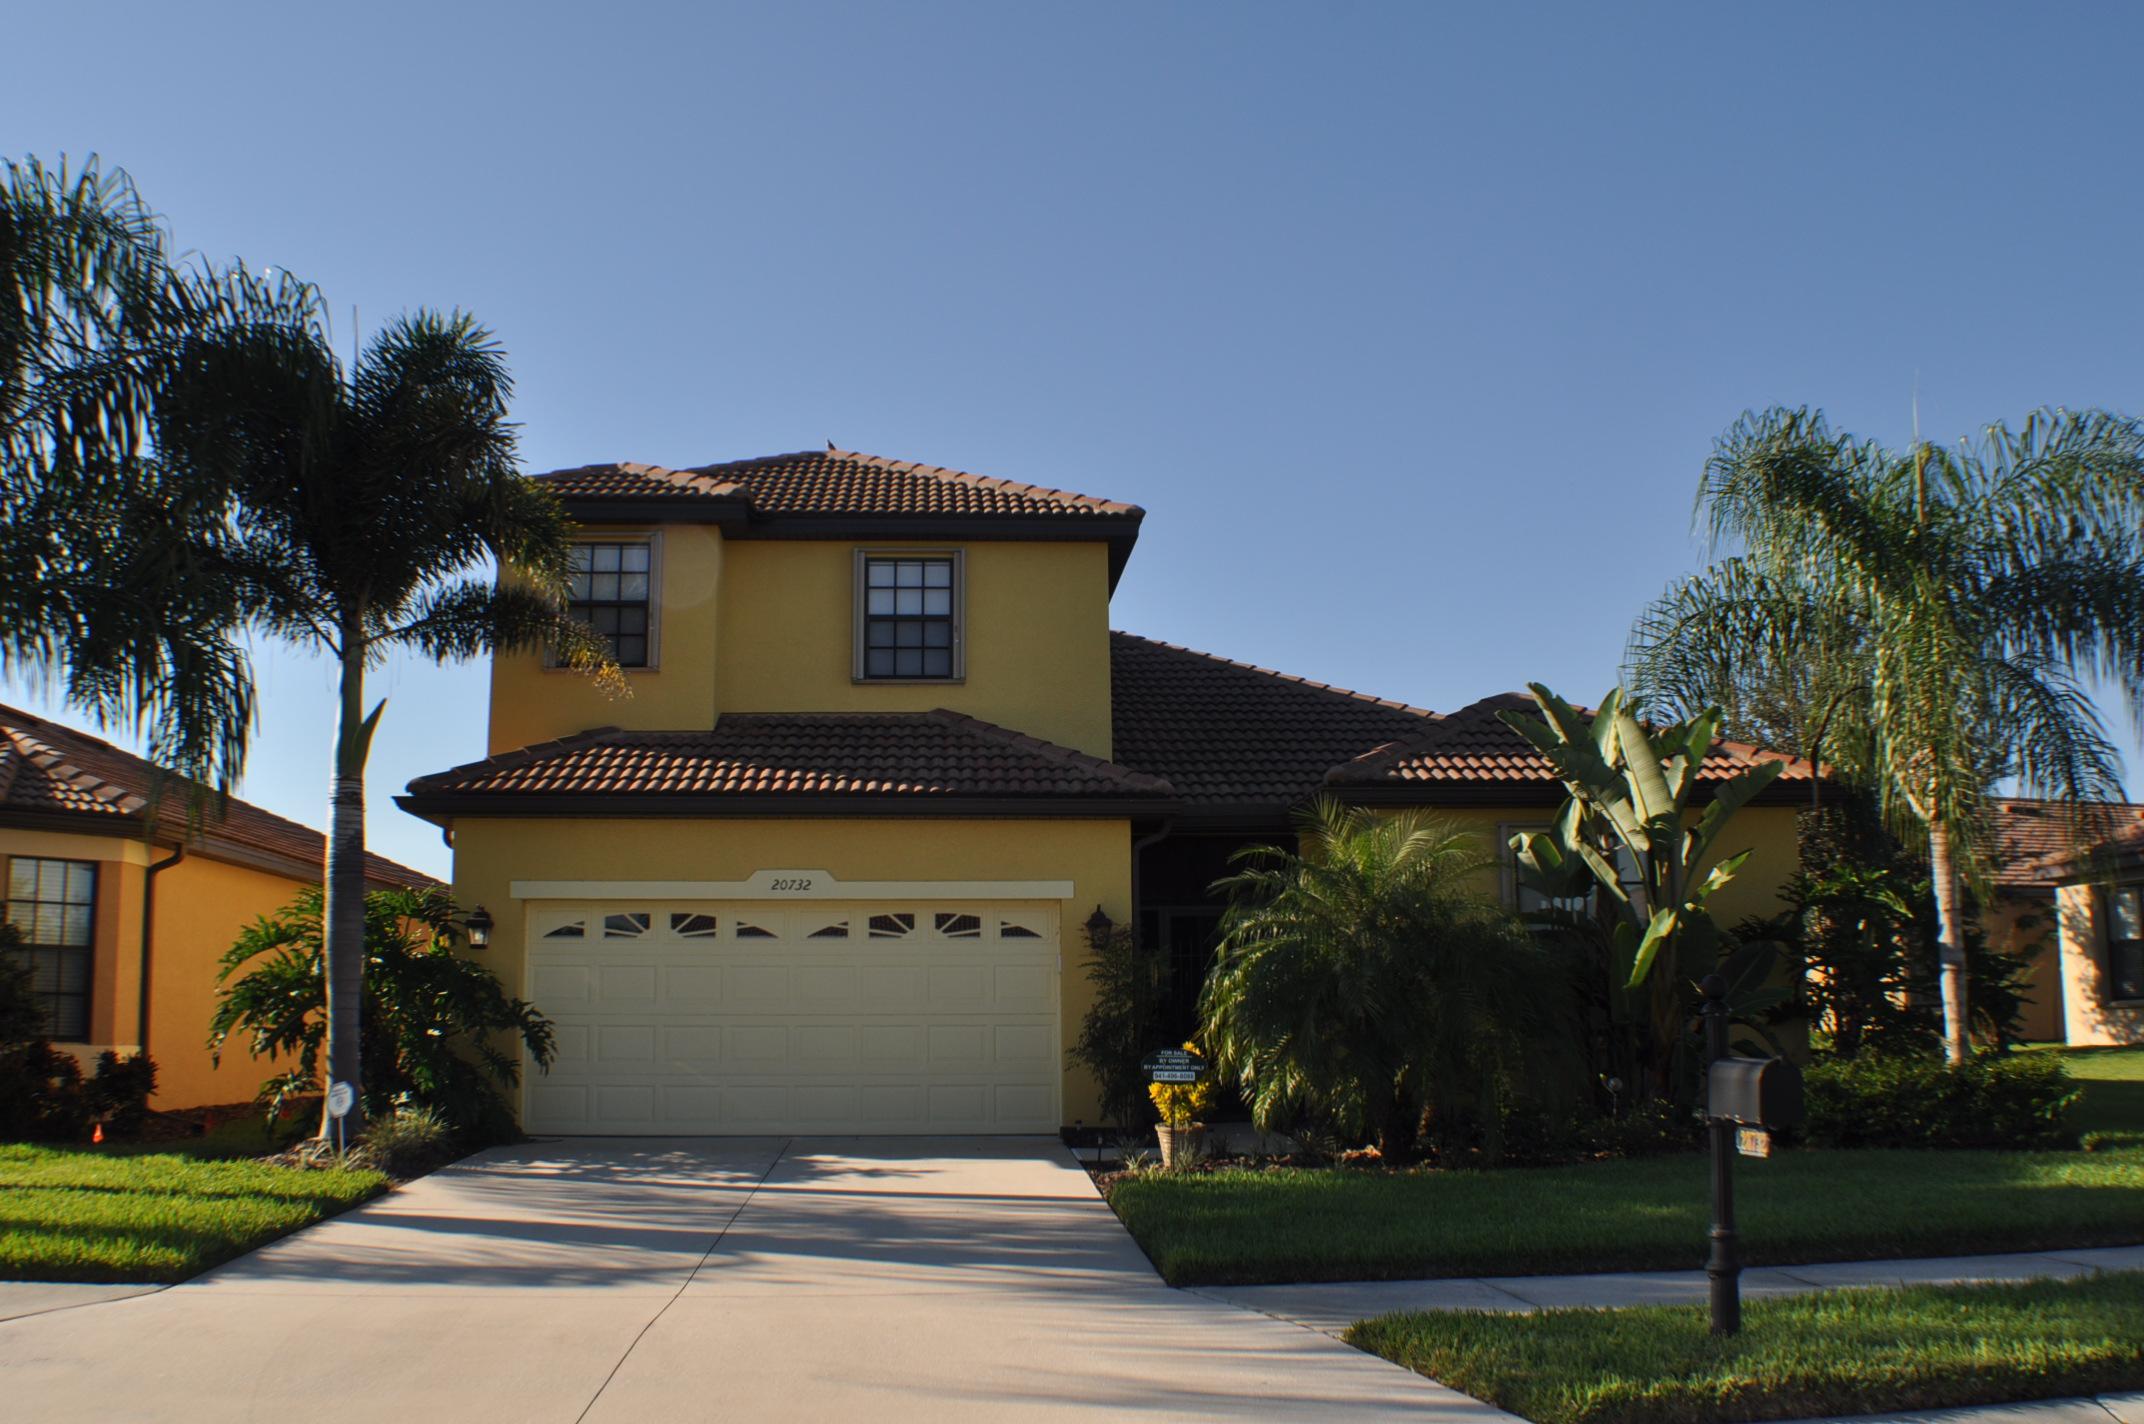 Home Painter Venice, Florida